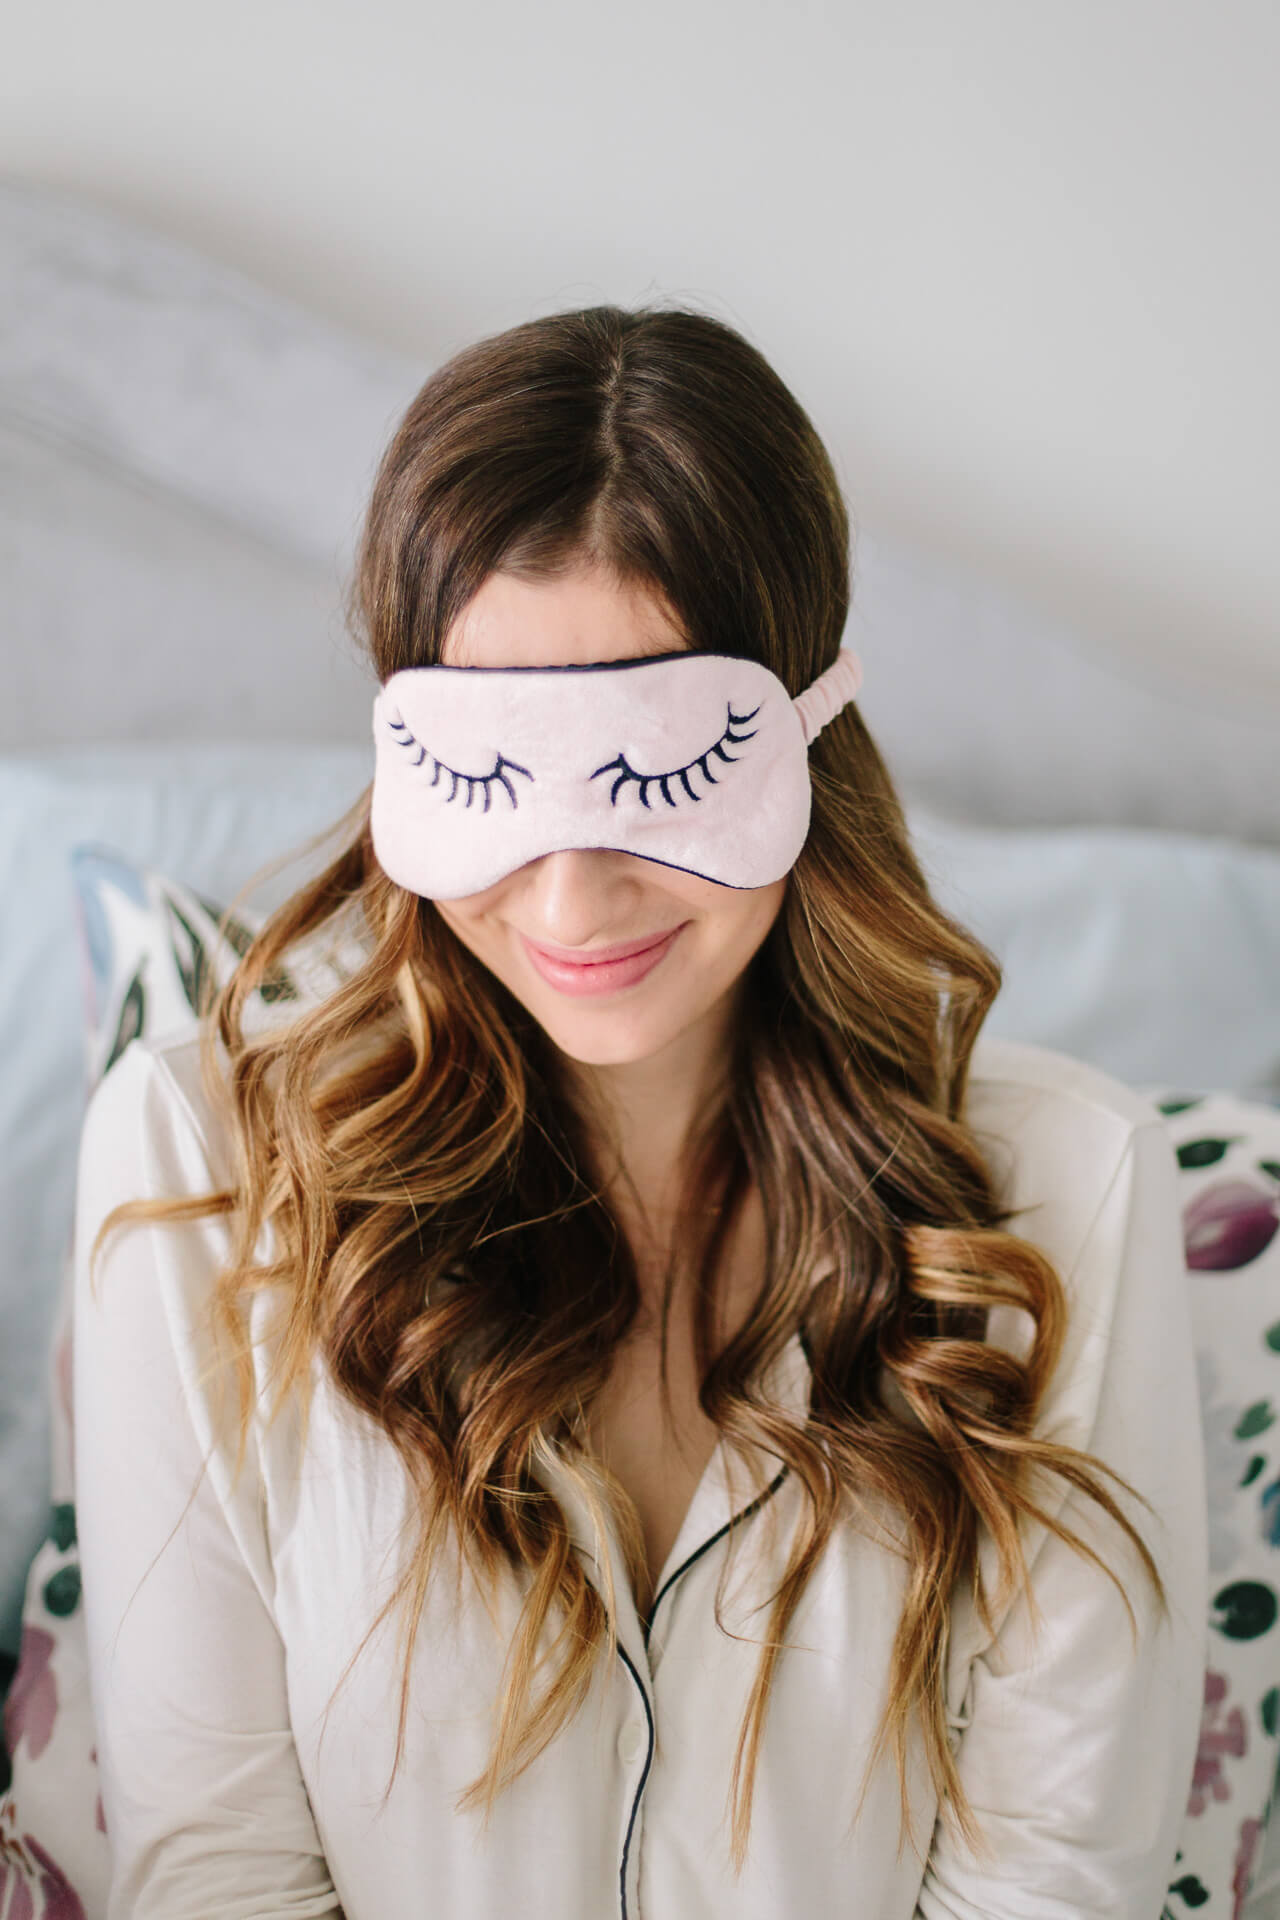 Love this cute sleep mask and the pretty pajamas